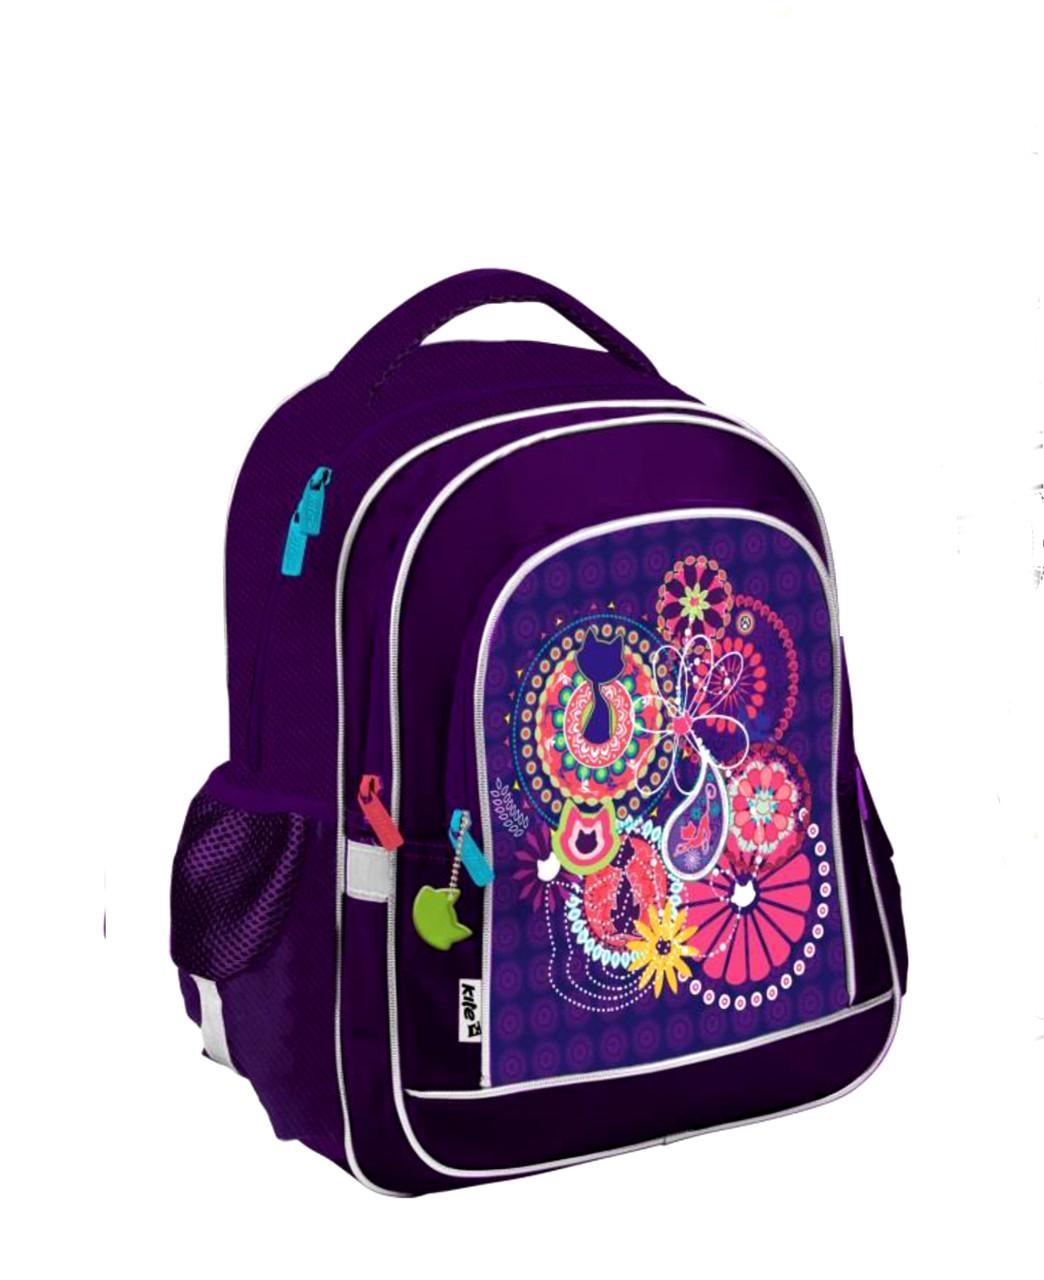 Рюкзак школьный каркасний Kite 509 Catsline K18-509S